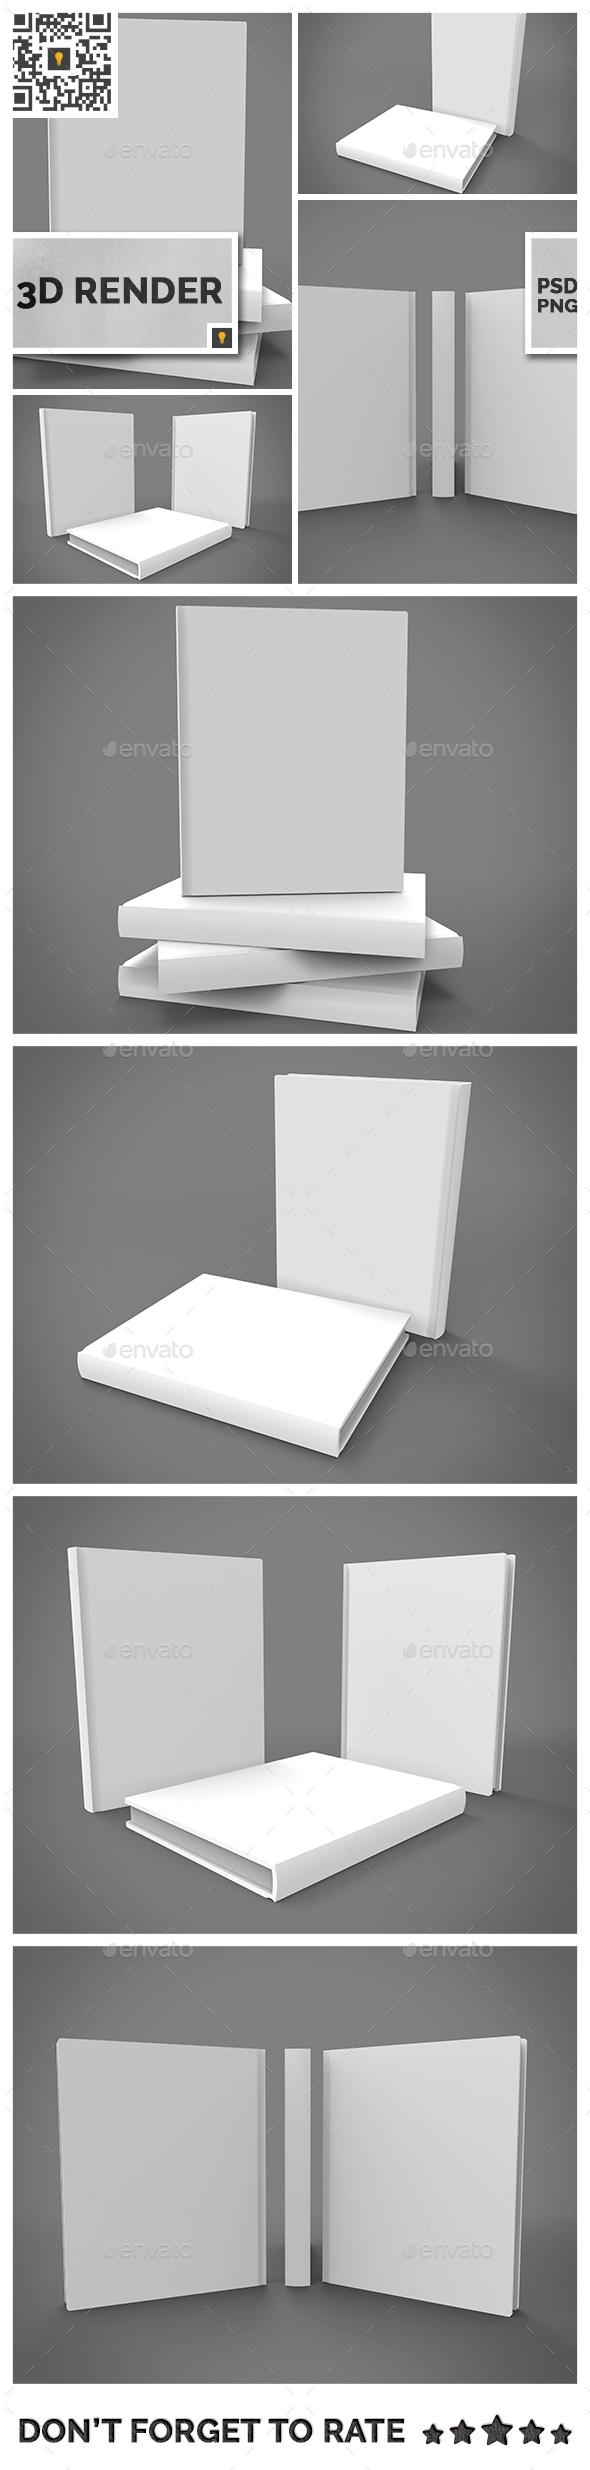 Book Set 3D Render - 3D Renders Graphics